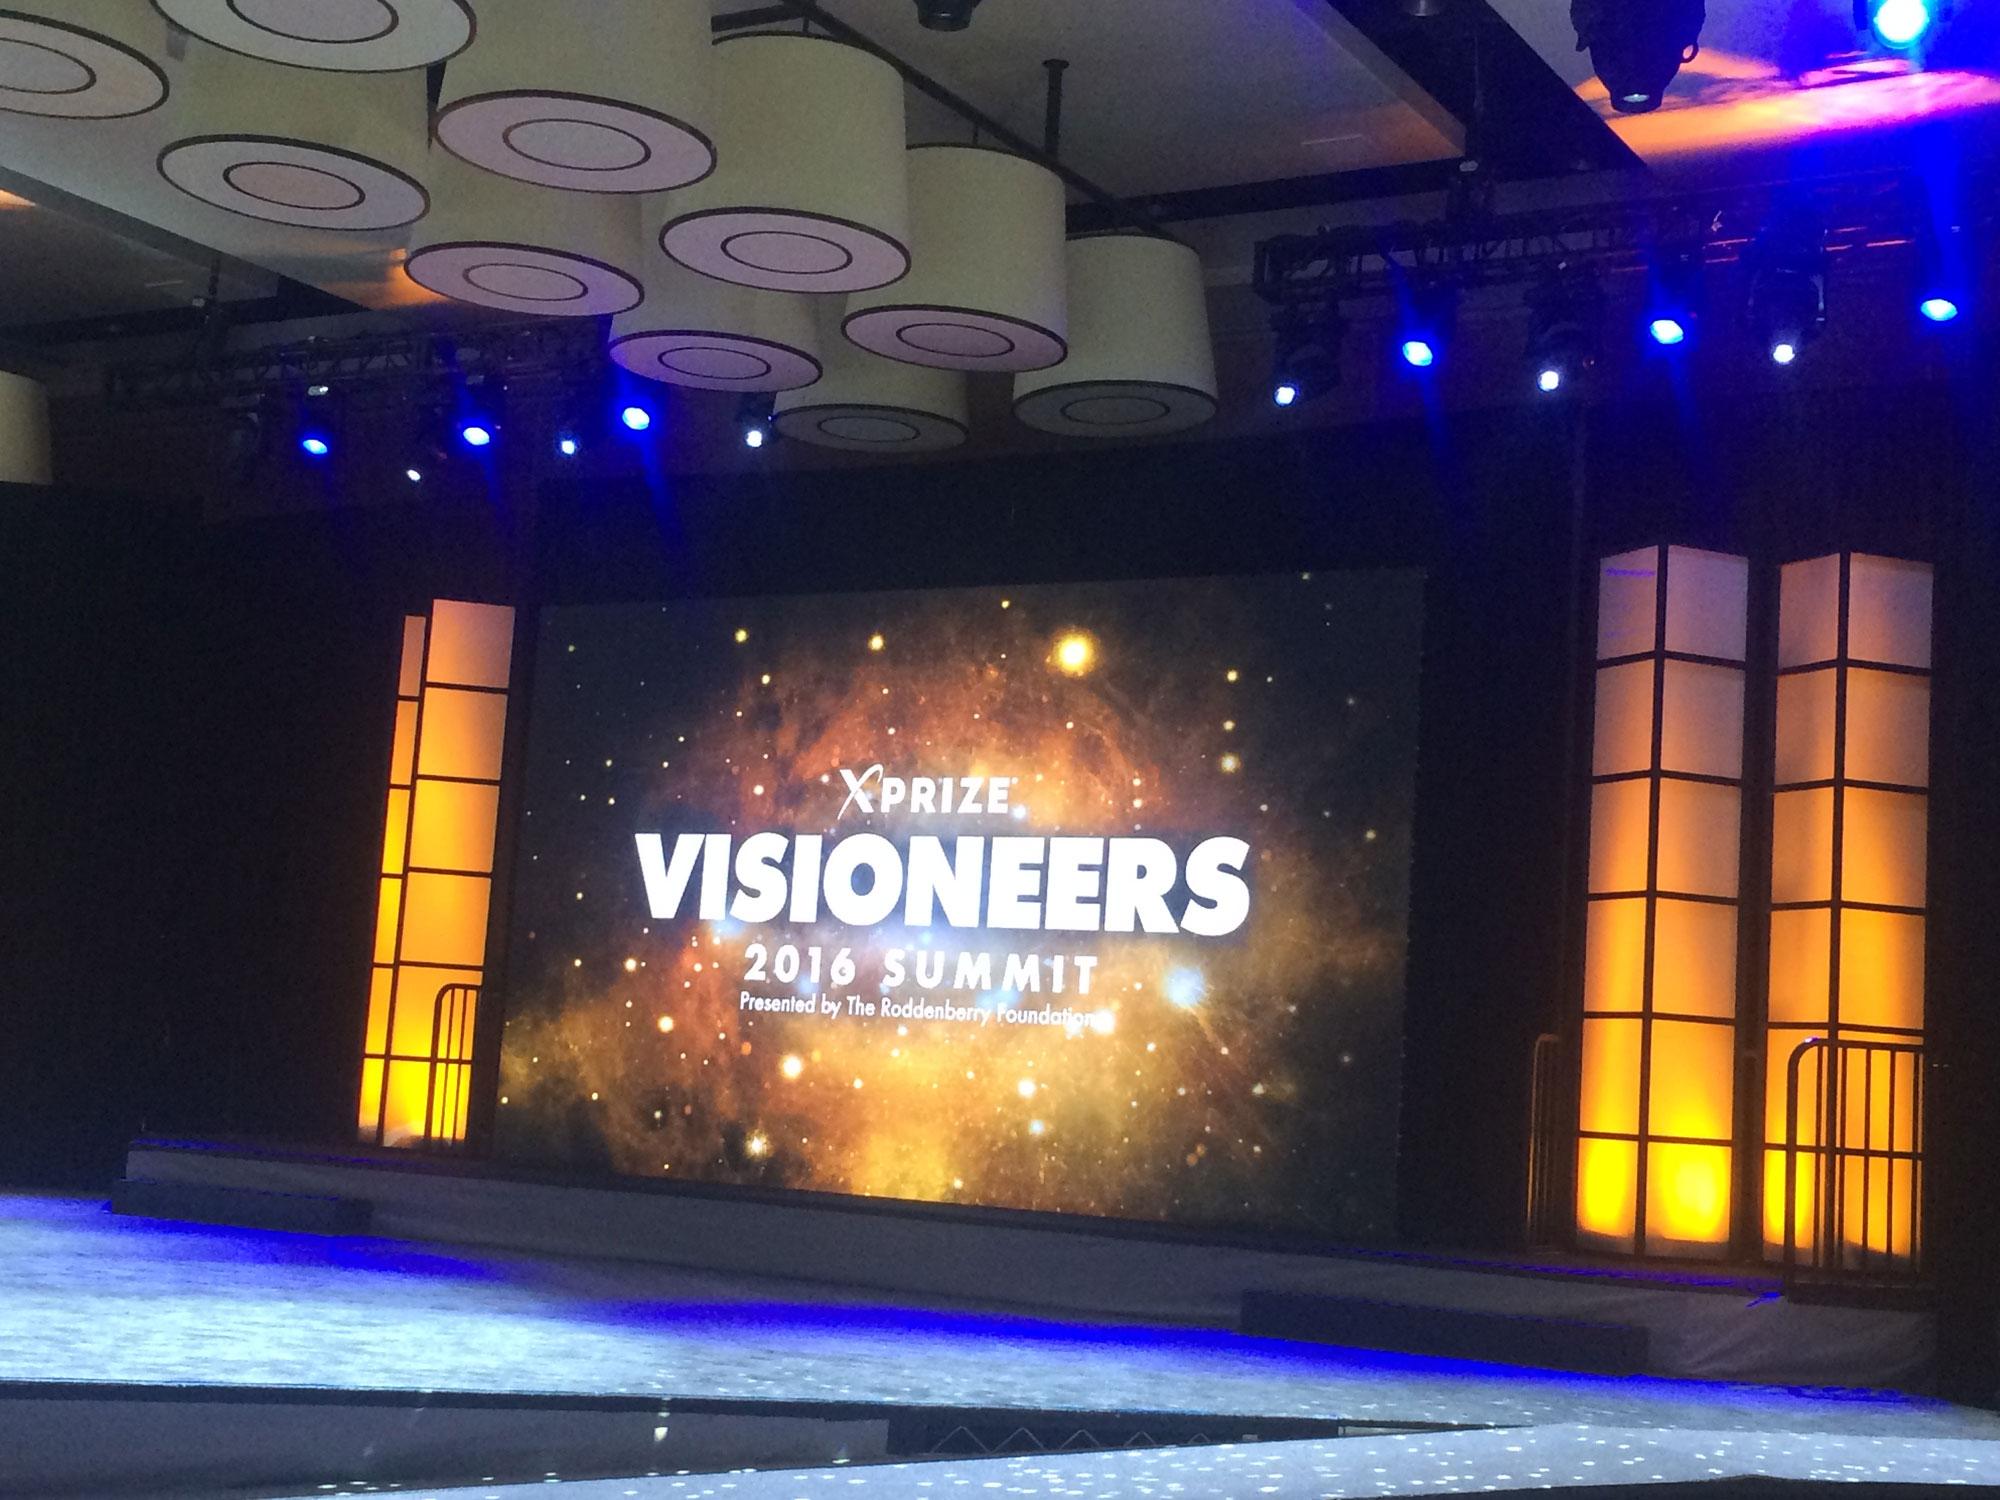 Visioneers Summit with Viv-q Teleprompting Service